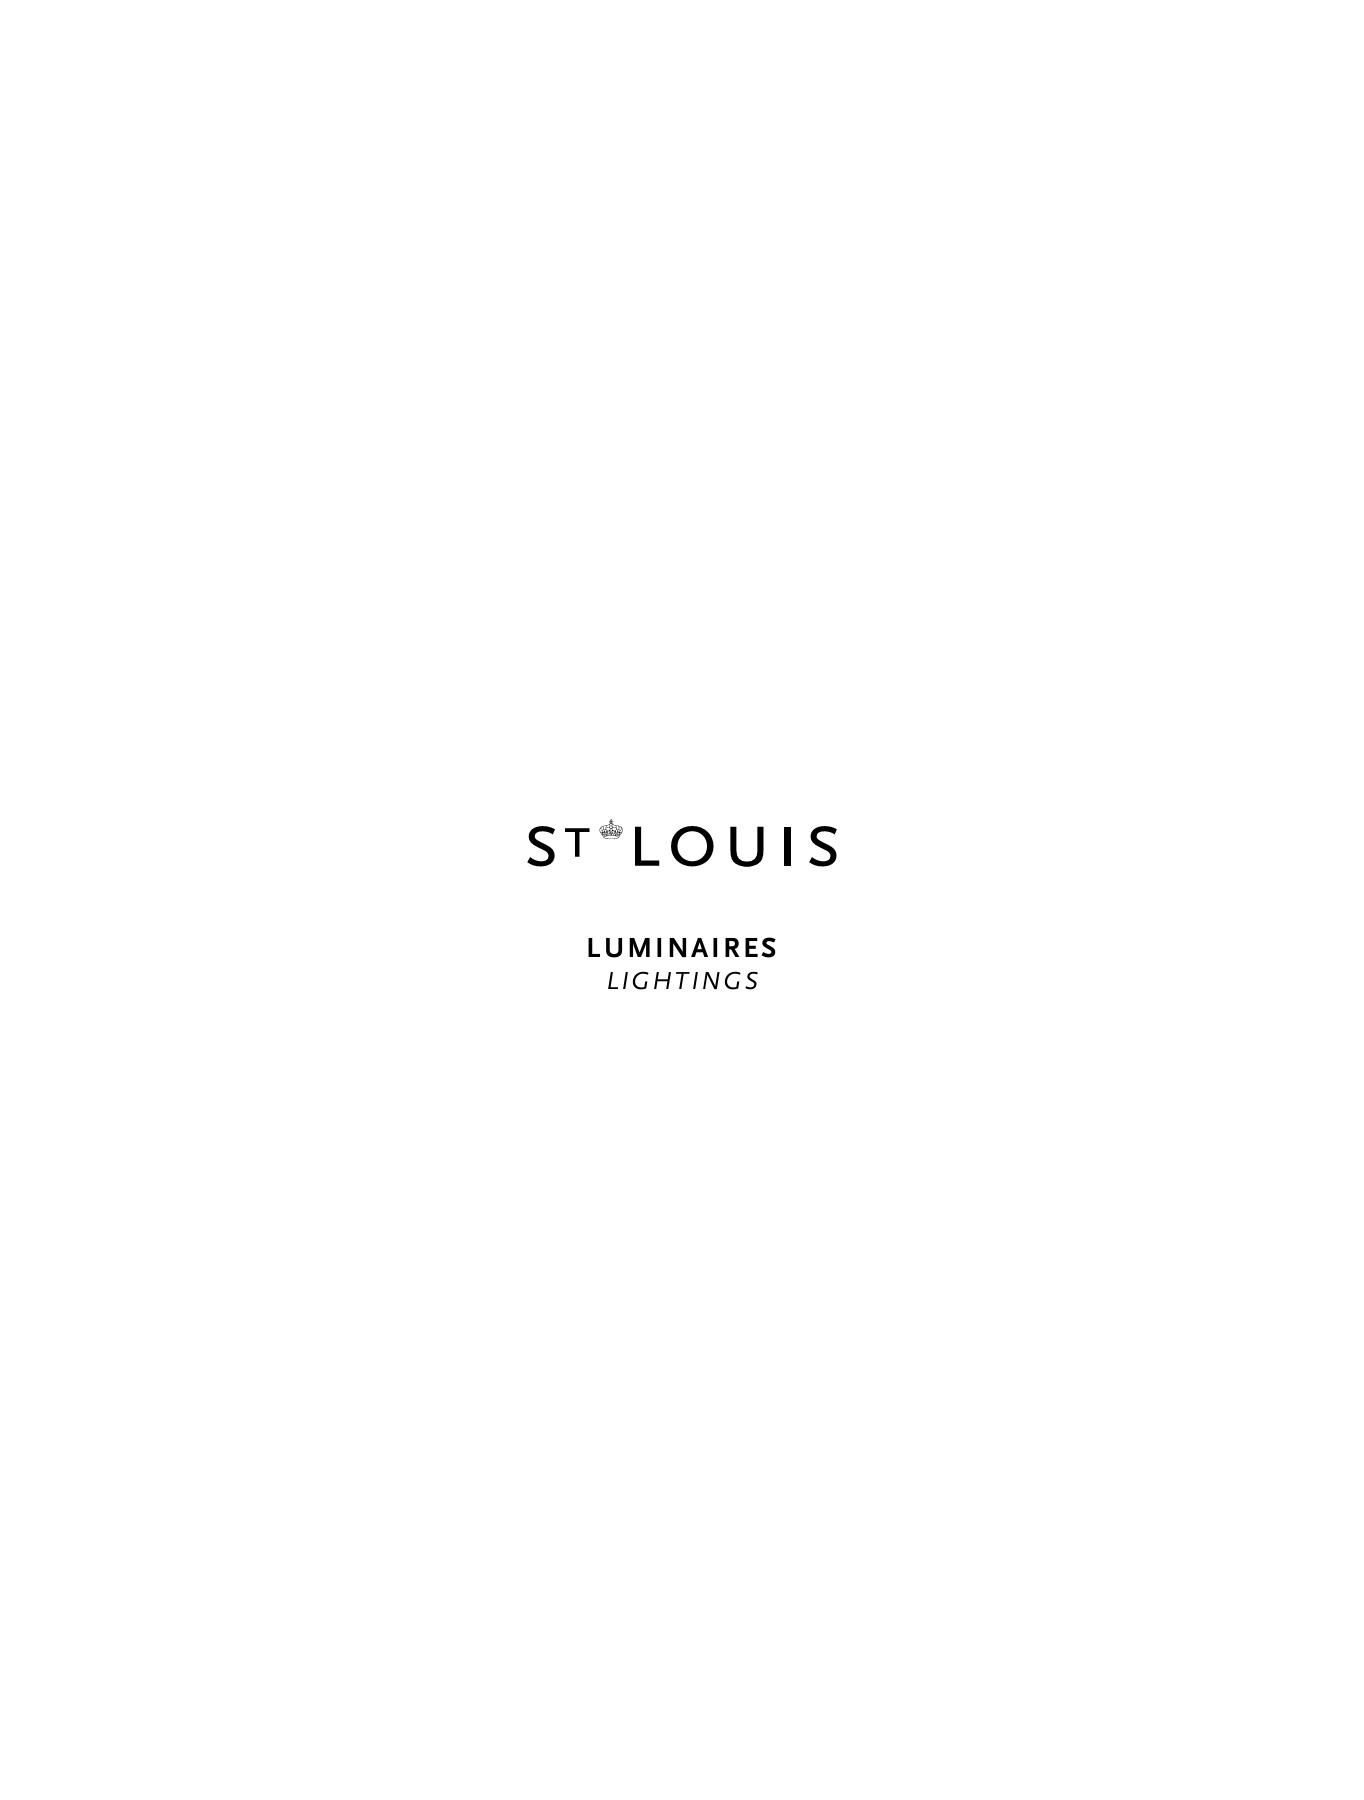 St Louis Lighting